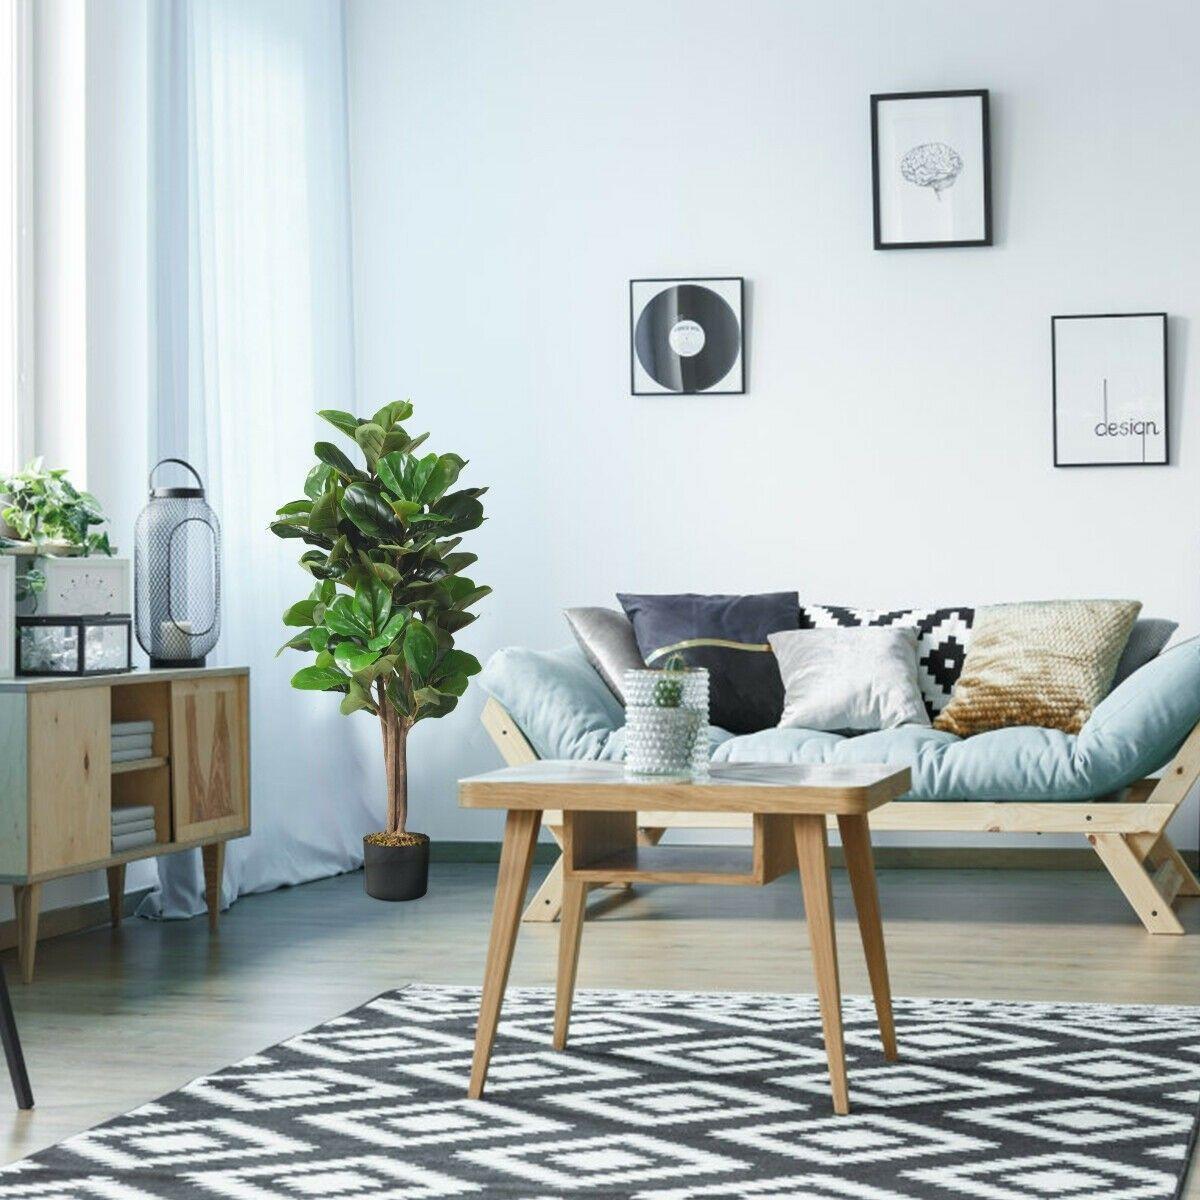 4ft Artificial Fiddle Leaf Fig Tree Decorative Planter Trending Decor Classic Living Room Living Room Plants